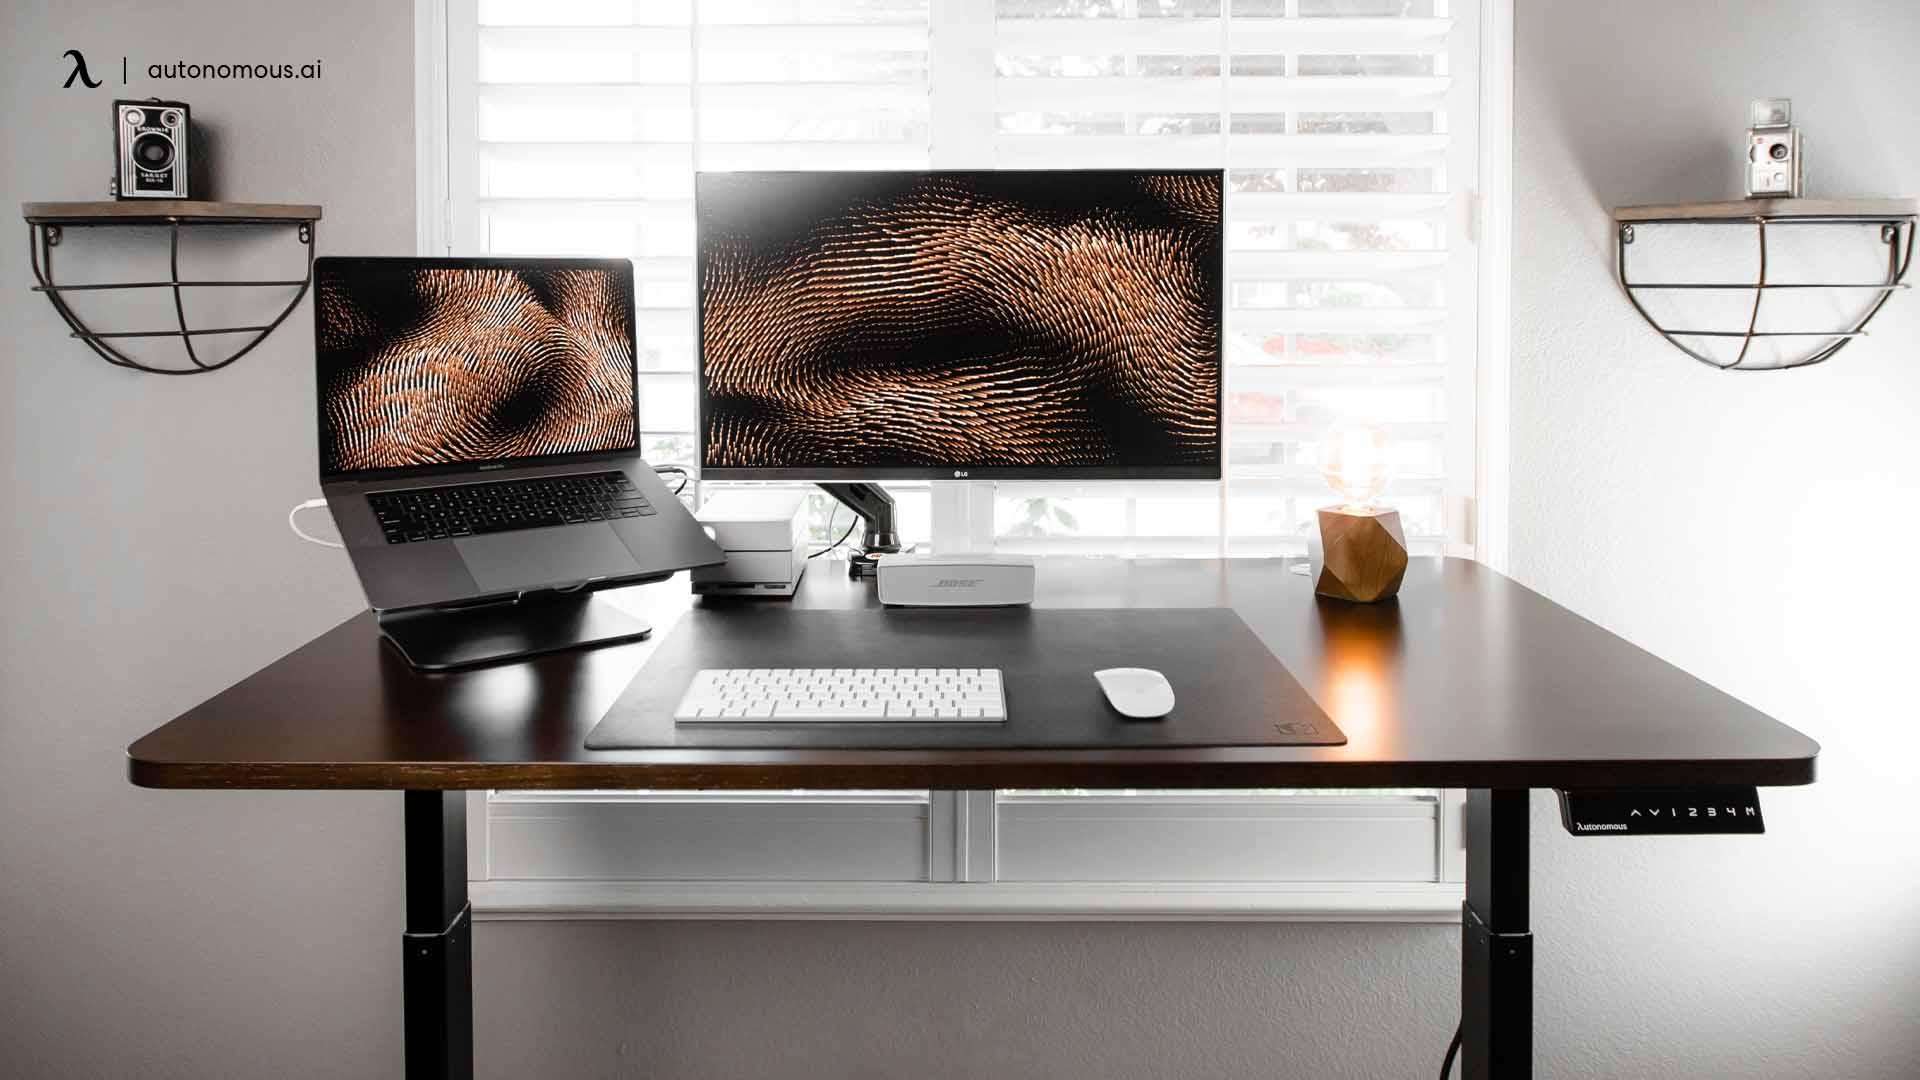 Our Definitive Minimalist Desk Setup Guide